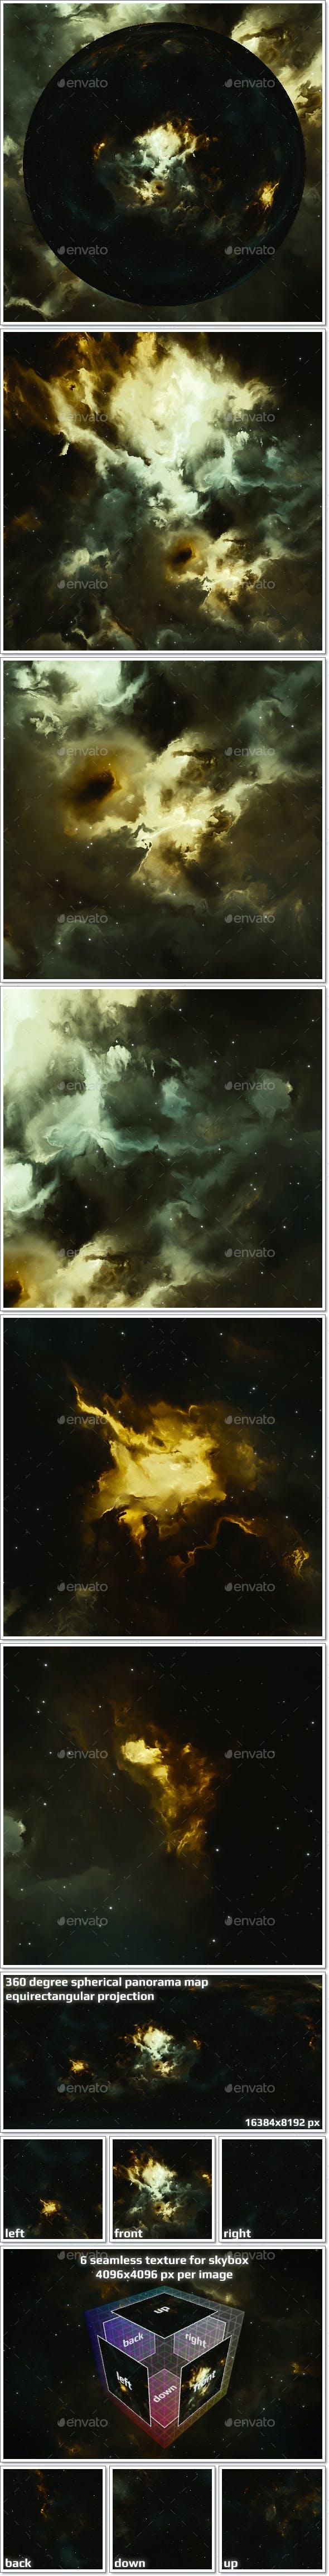 Nebula Space Environment HDRI Map 025 - 3DOcean Item for Sale